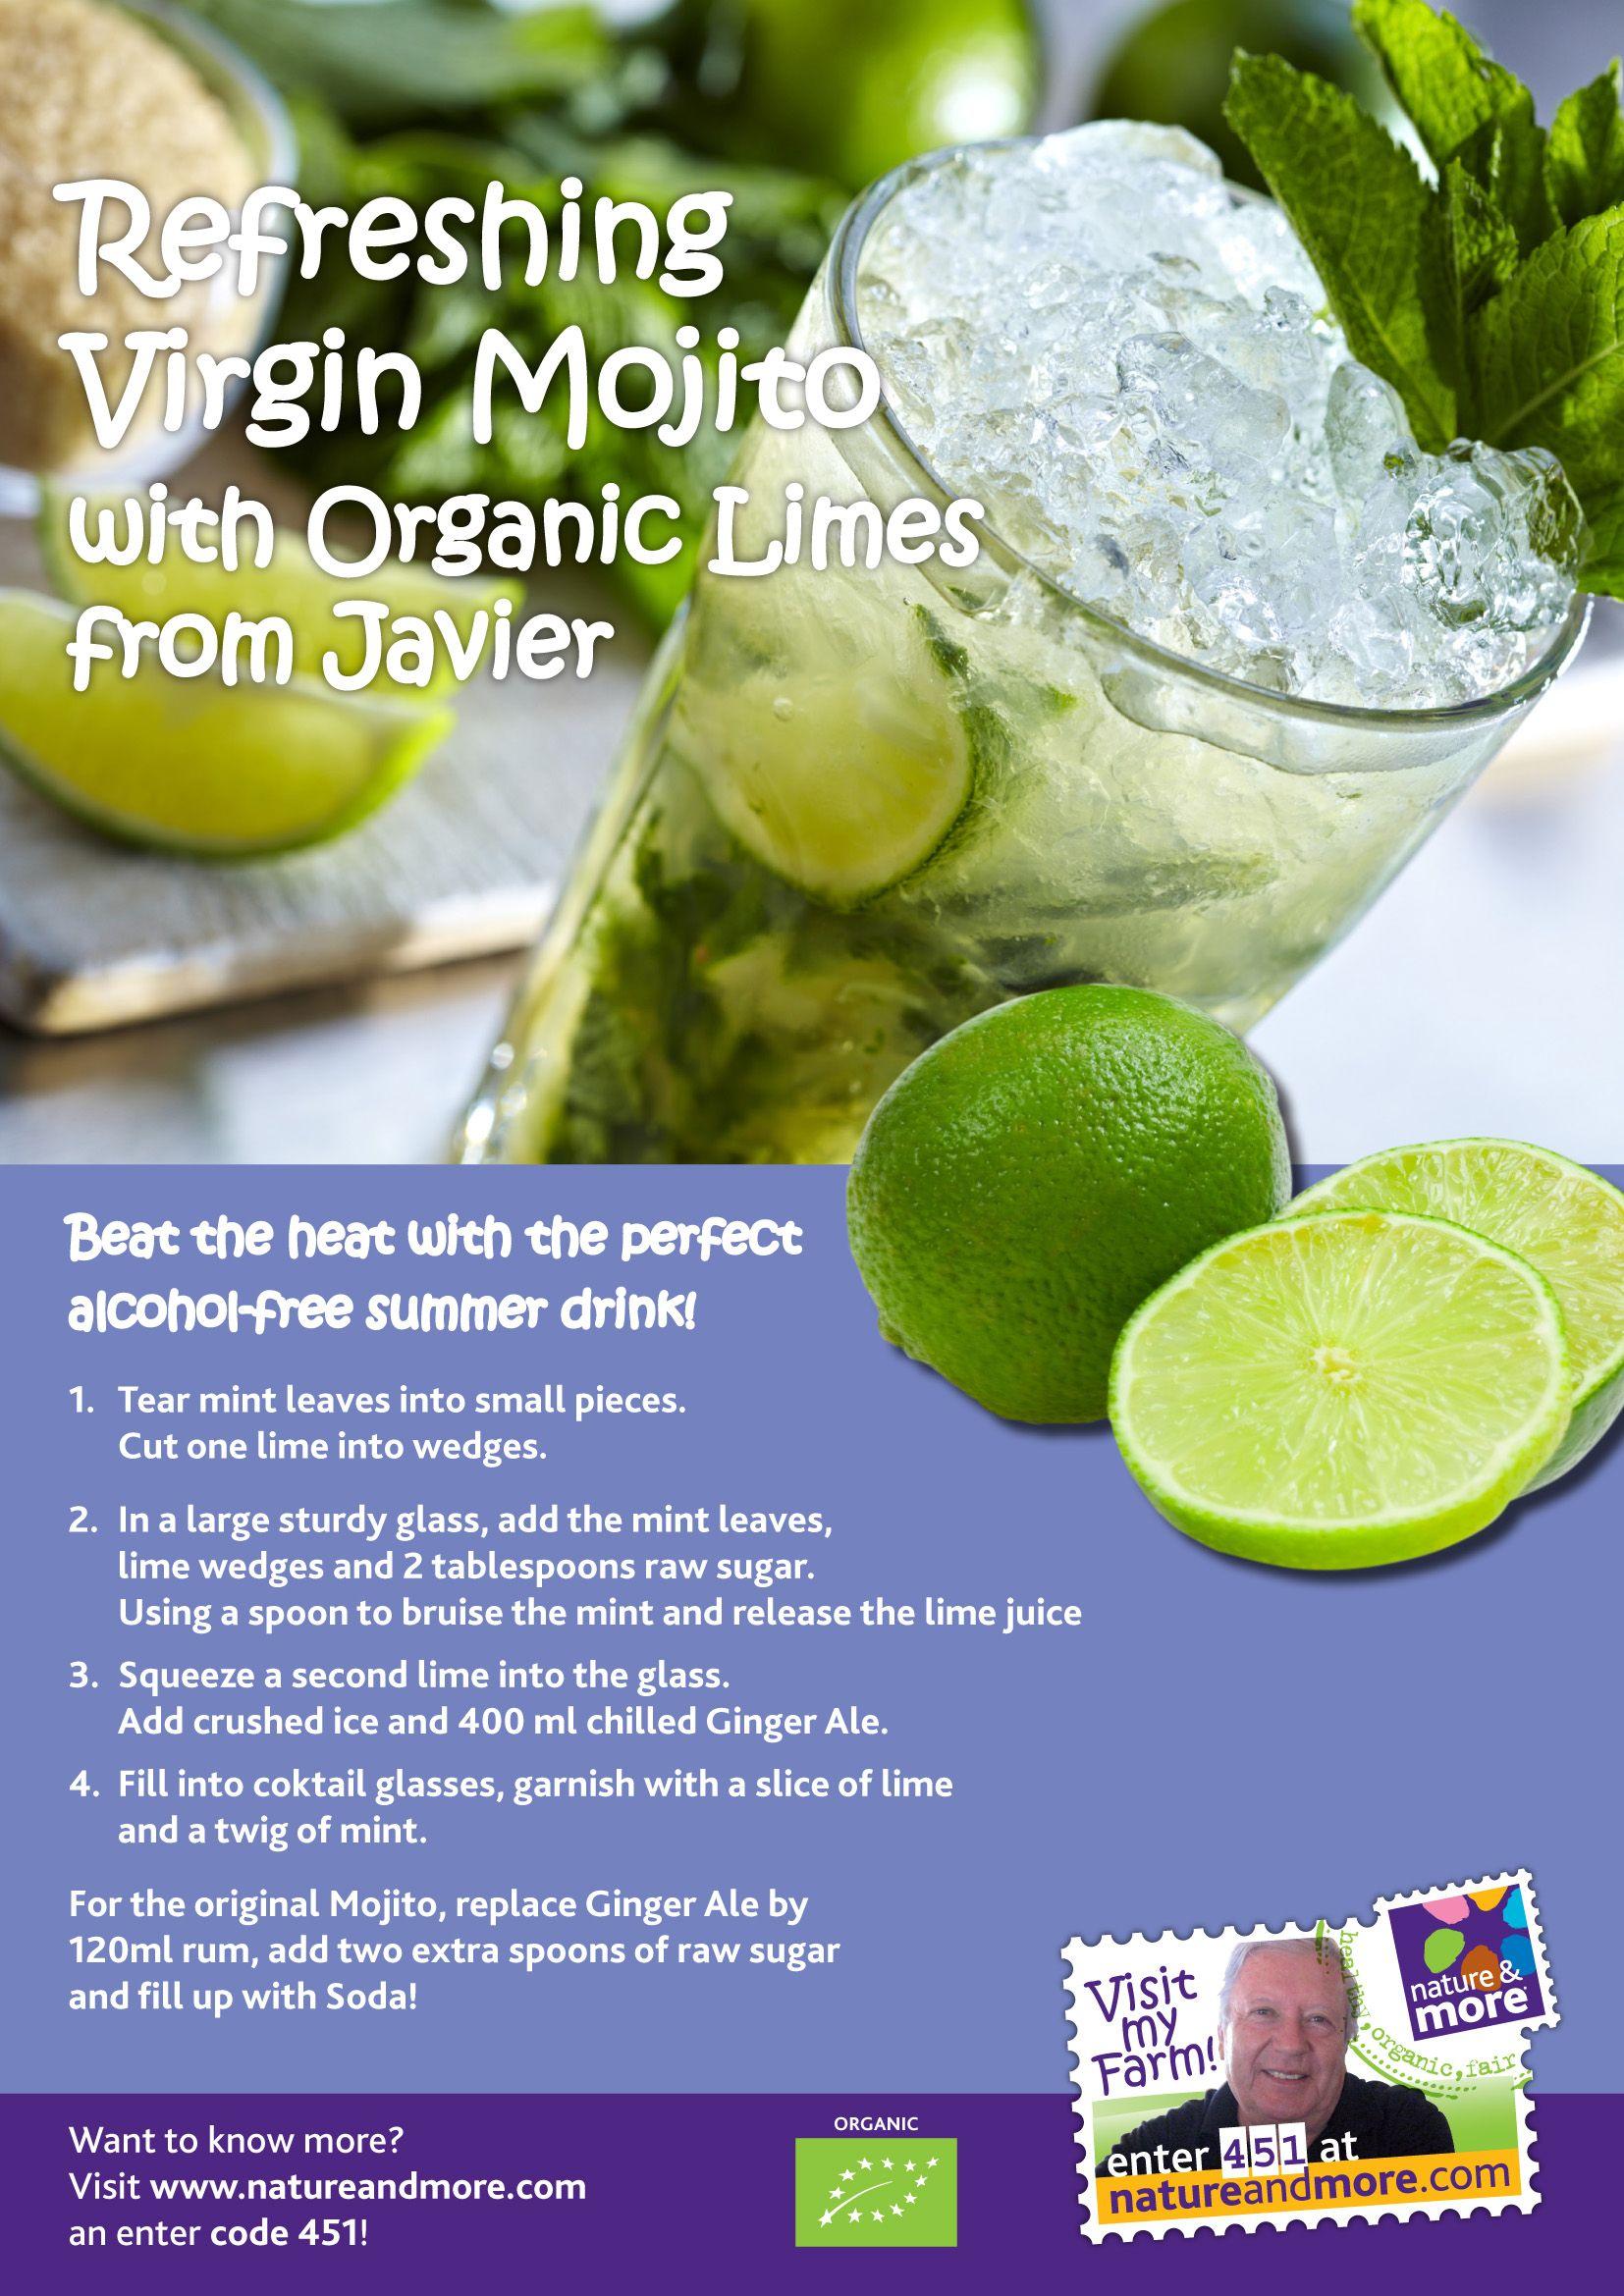 Refreshing Organic Virgin Mojito Recipe Organic Limes Natureandmore Summer Bbq Organic Recipes Orange Recipes Summer Drinks